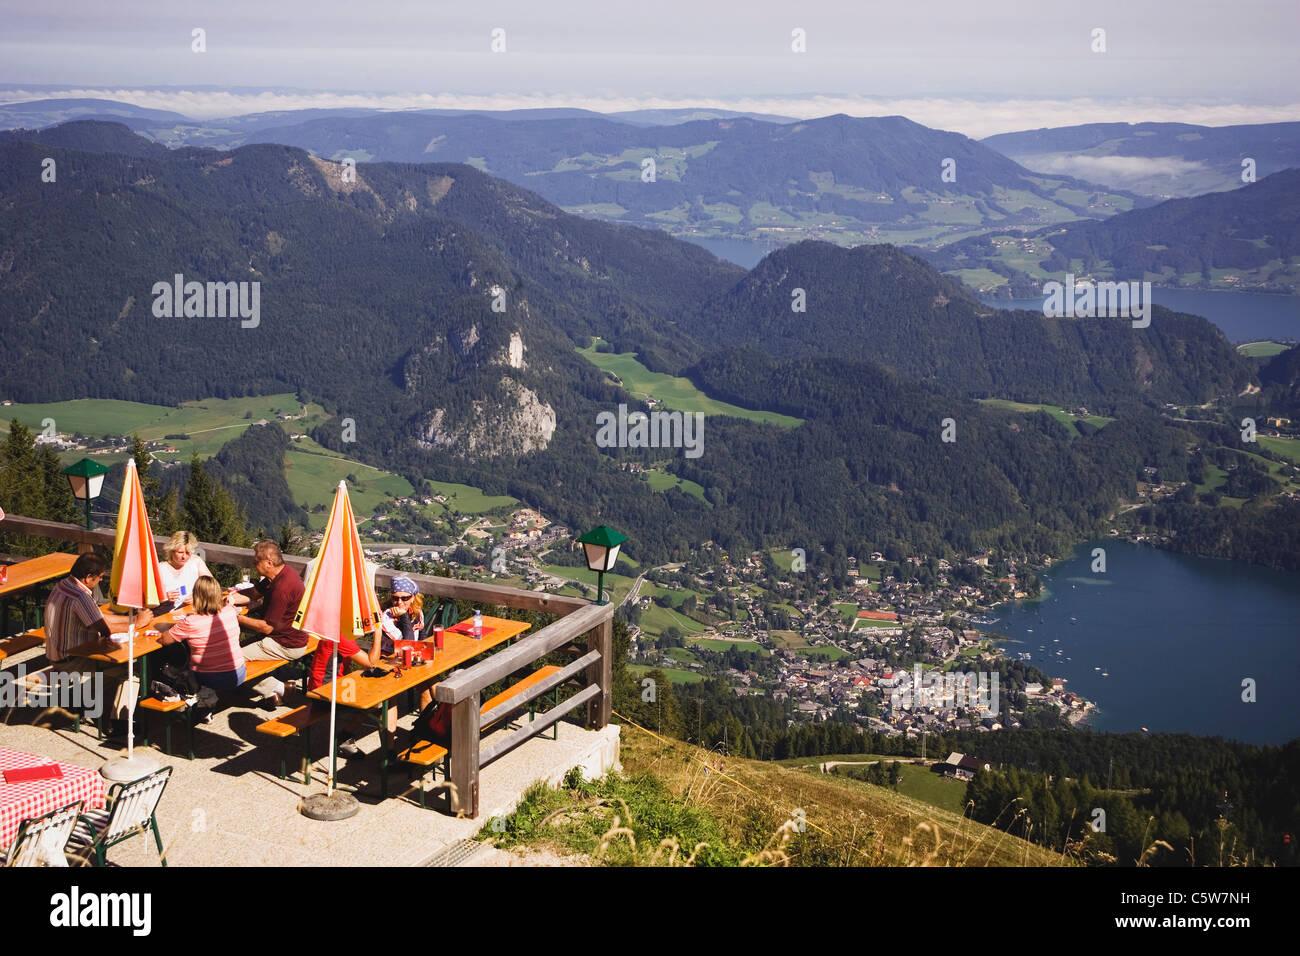 Austria, St Gilgen, Lake Wolfgangsee, Zwölferhorn, Tourists in beer garden - Stock Image